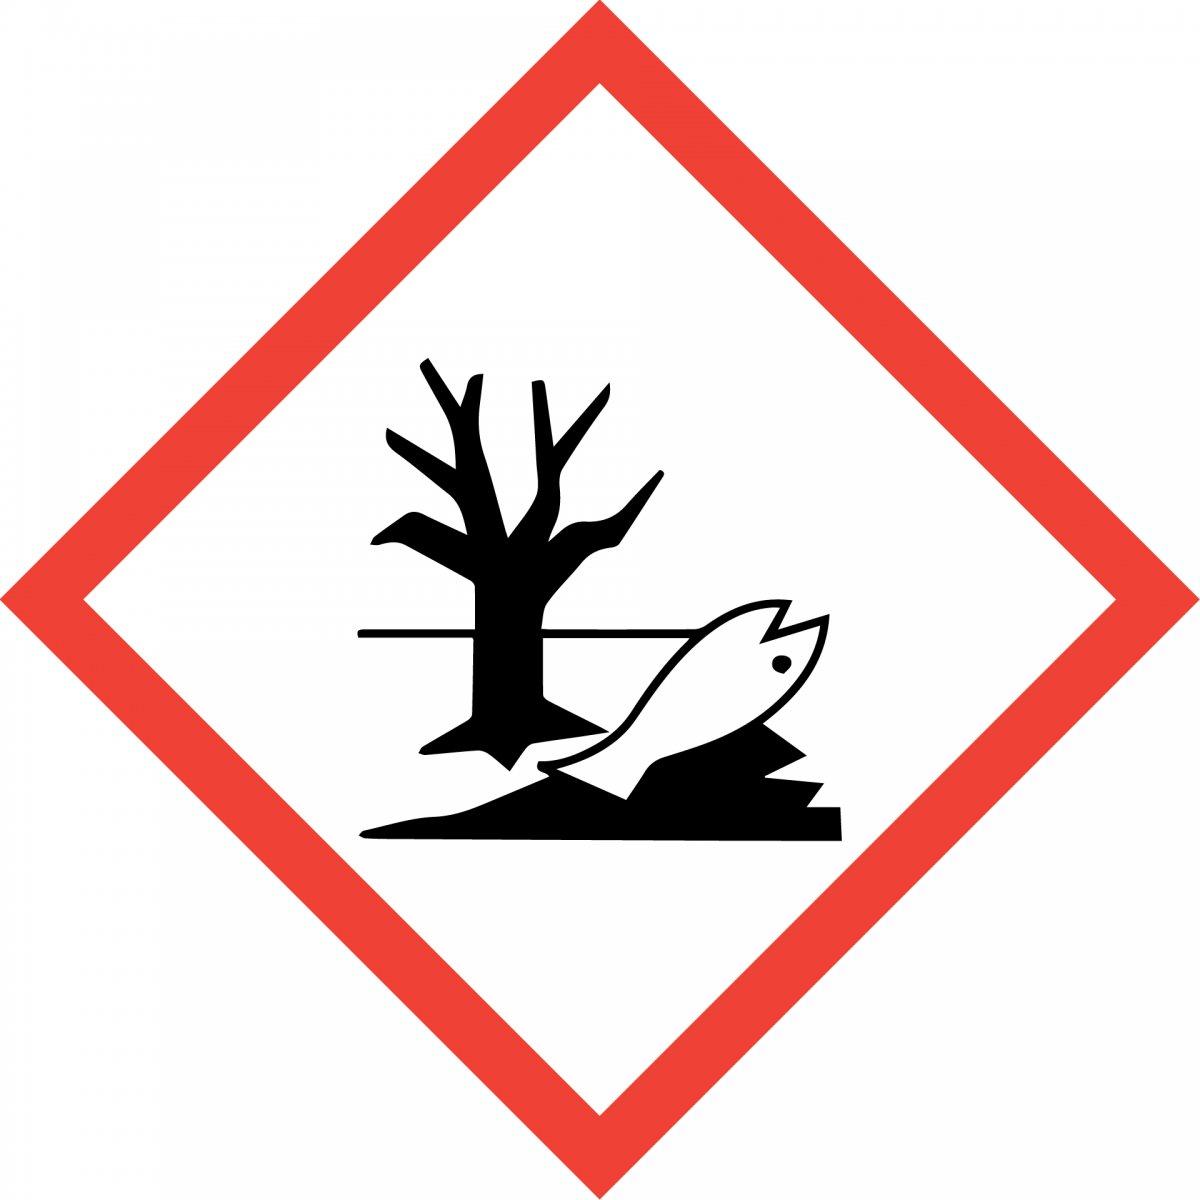 harmful-to-the-environment.jpg